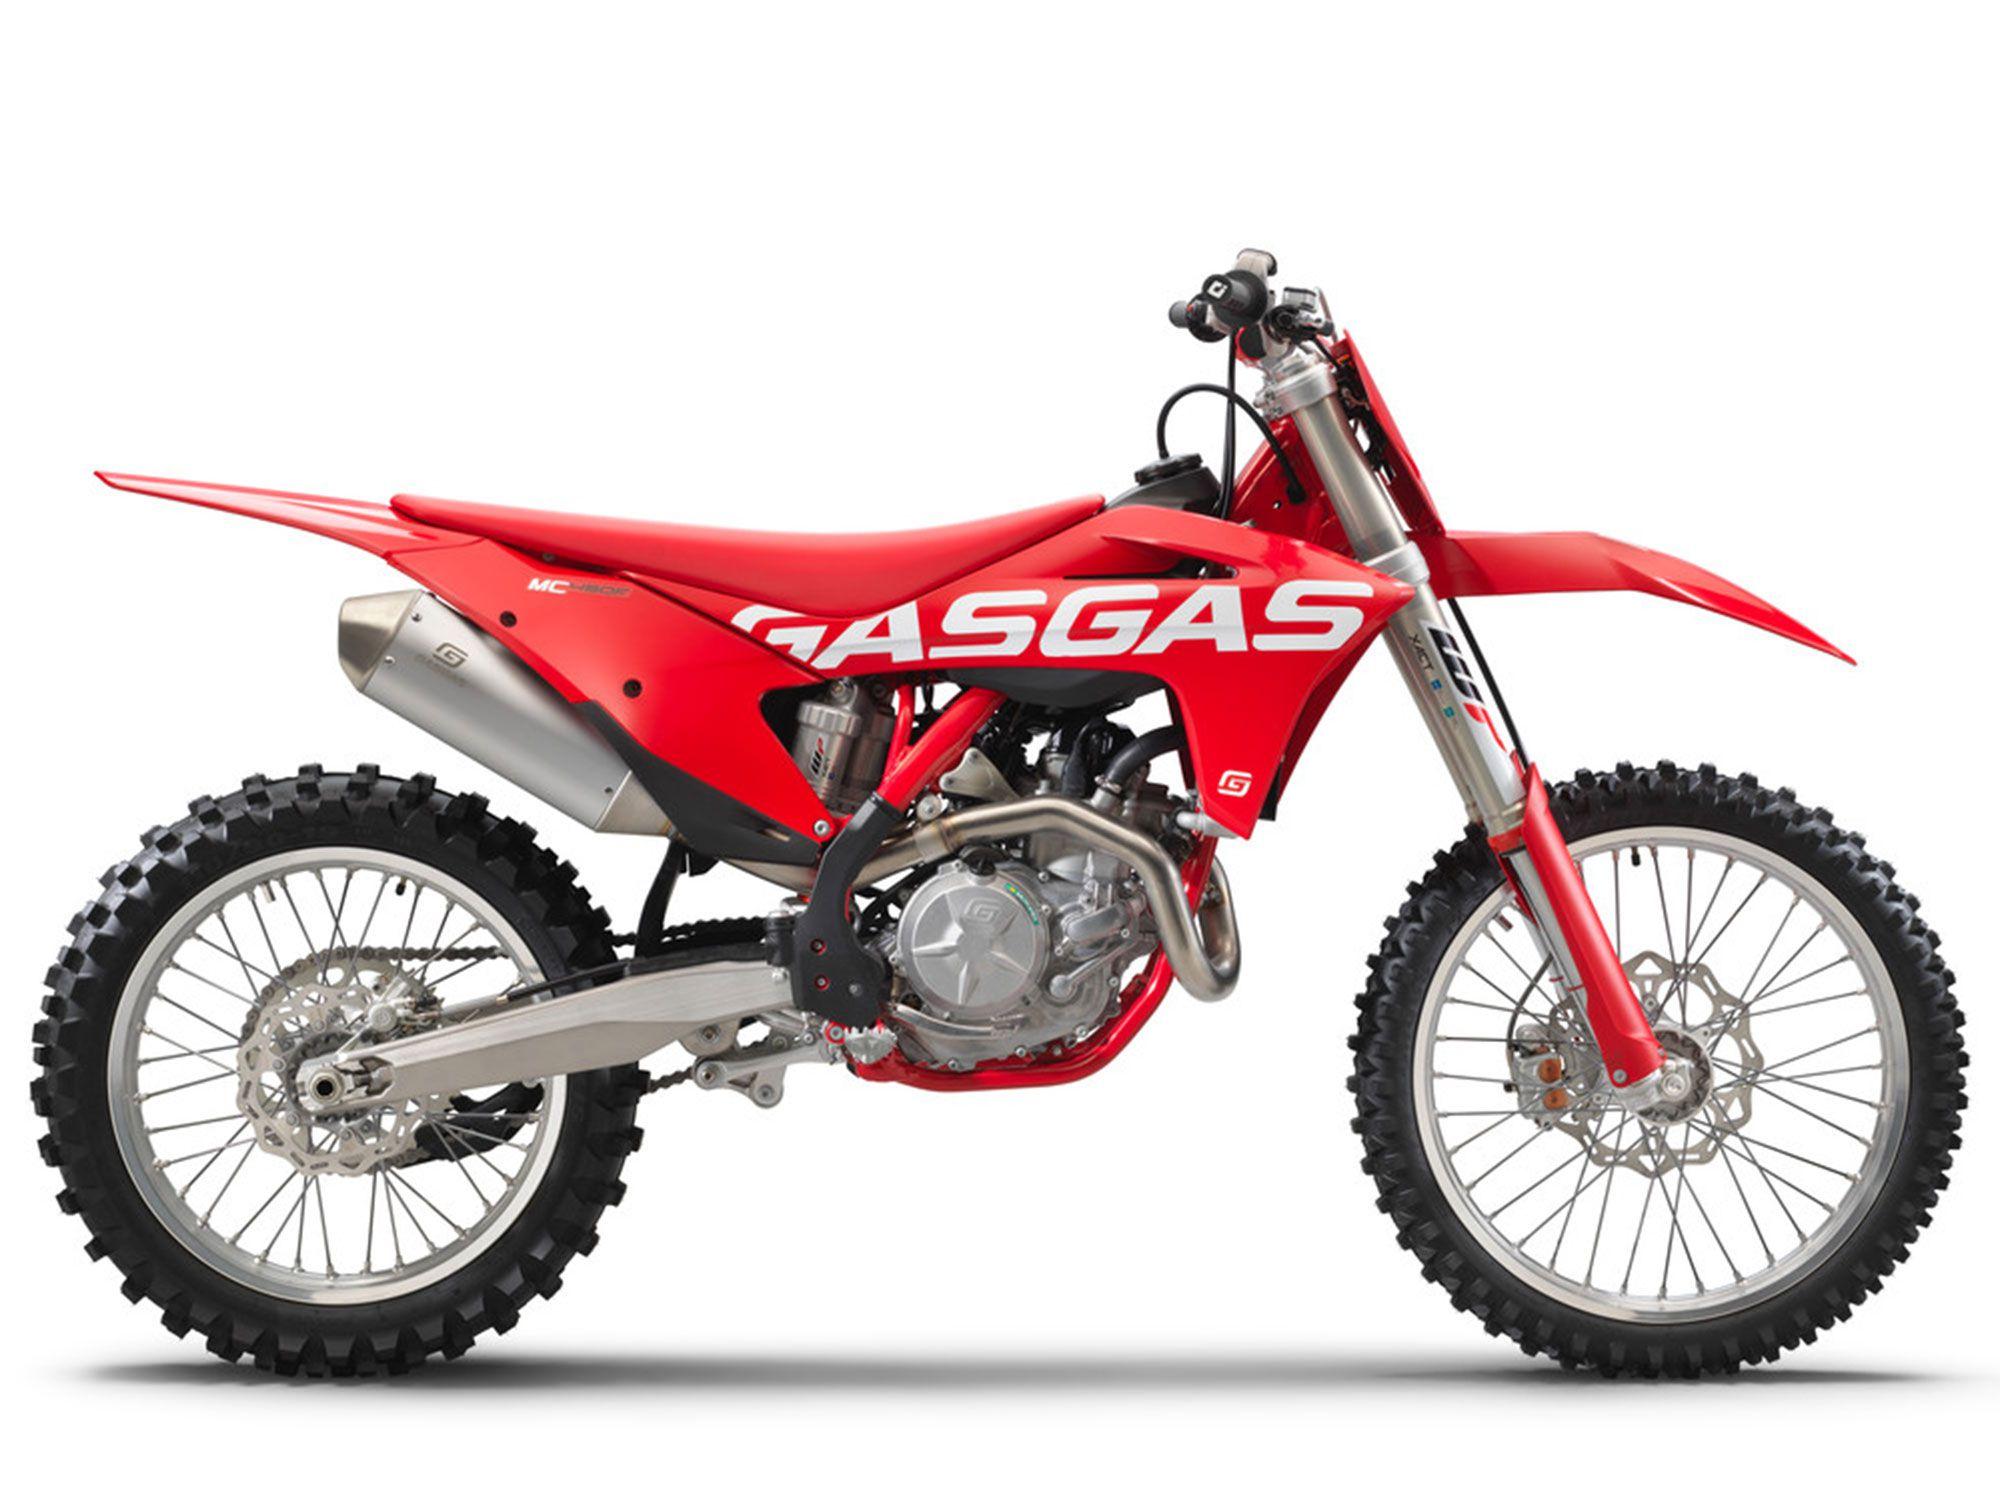 2021 GasGas MC 450F